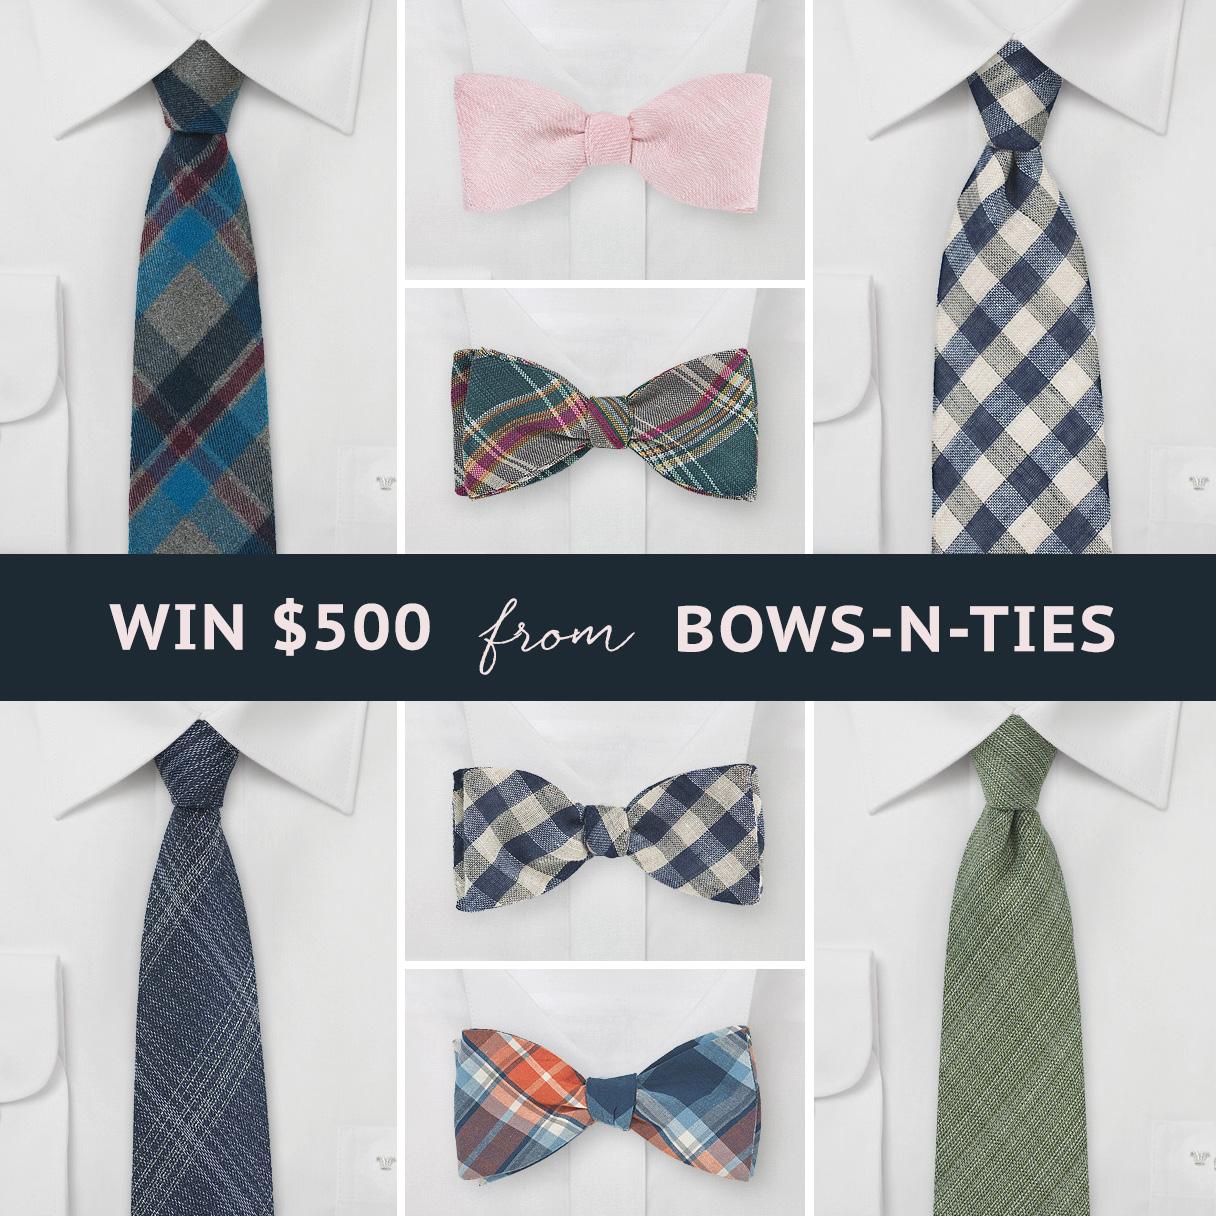 Win $500 Worth of Ties from Bows-N-Ties